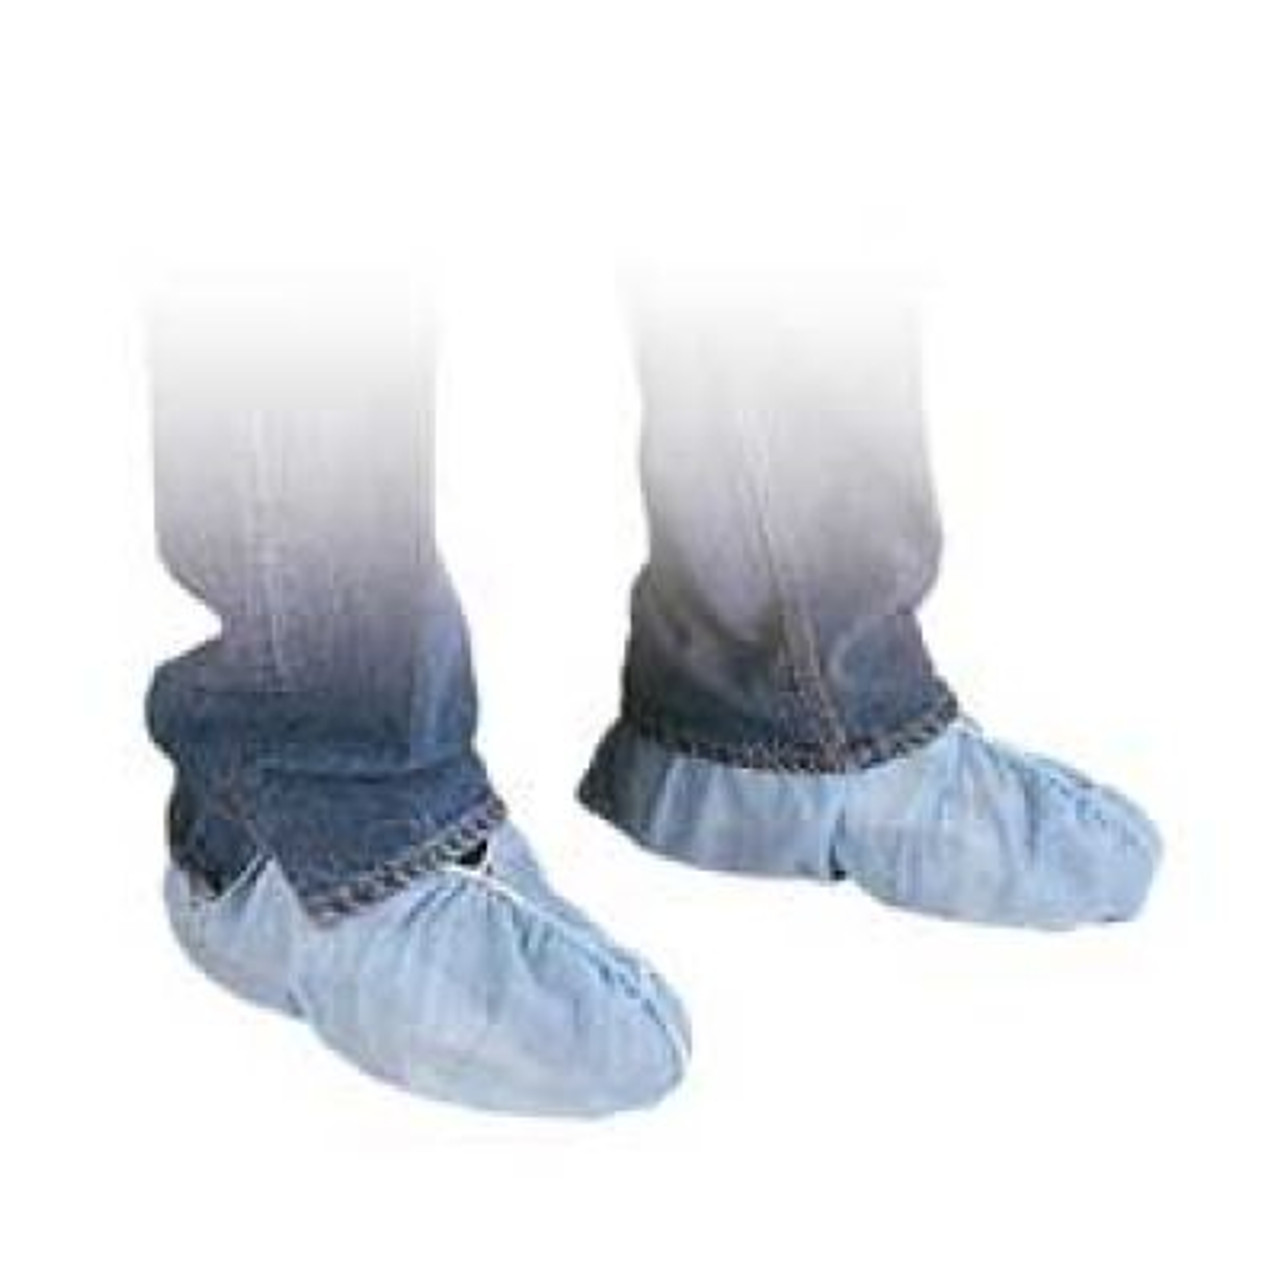 Disposable Polypropylene Shoe Covers